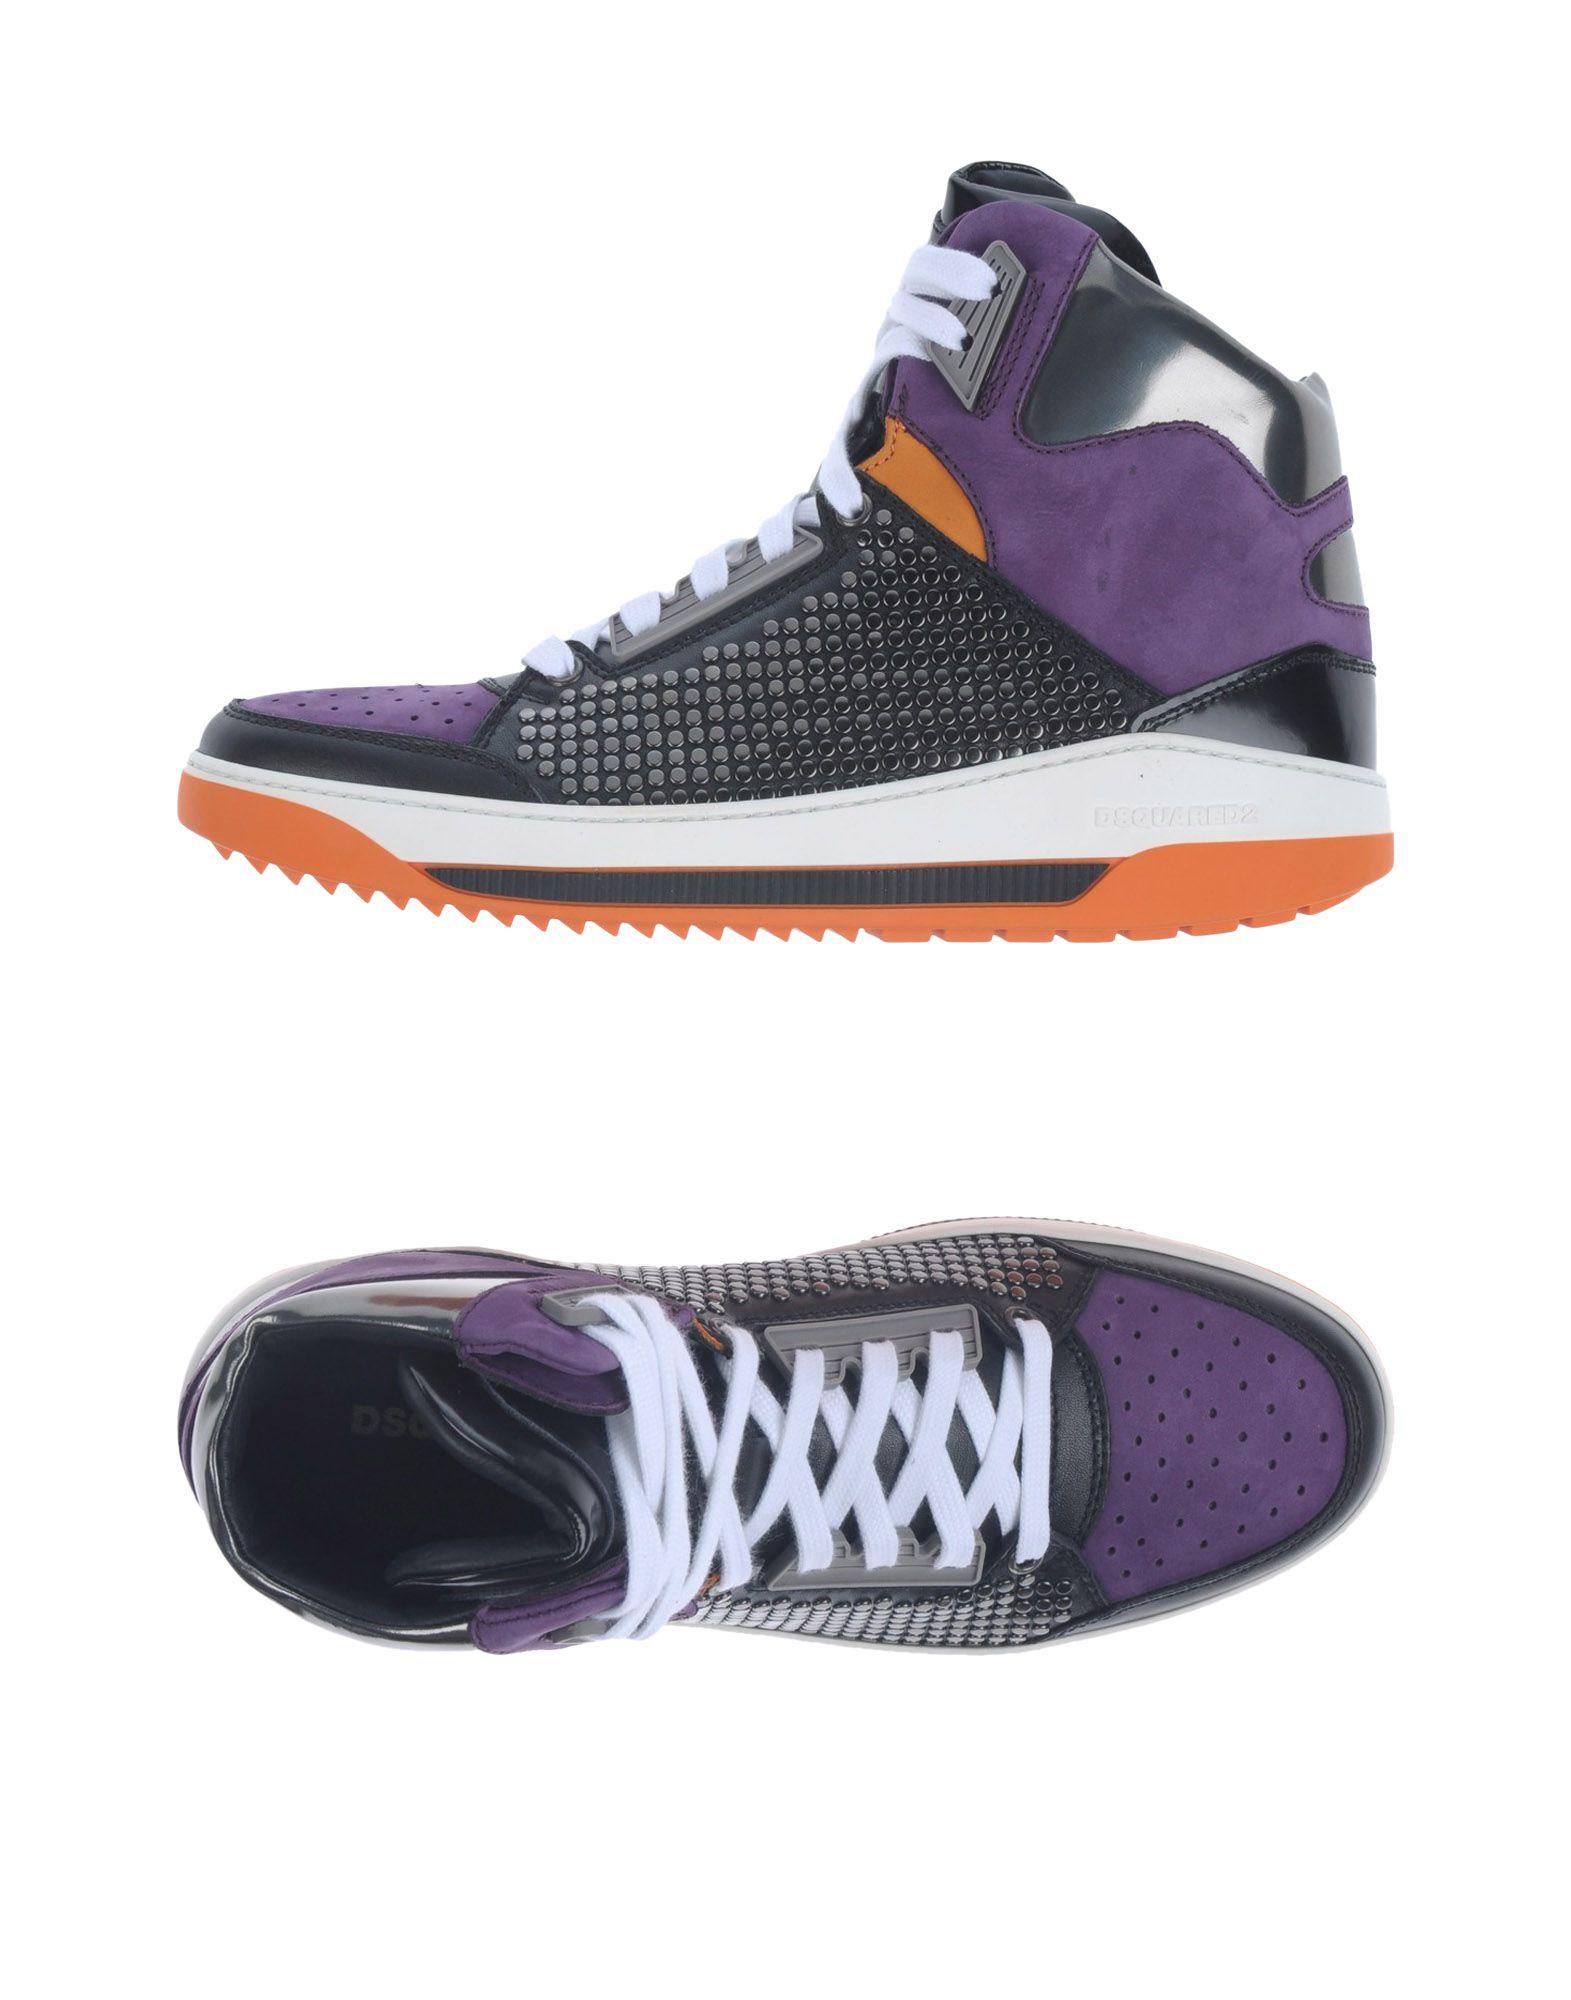 Dsquared2 Sneakers - Men  Dsquared2 Sneakers online on  Men Canada - 11168060HN f45e72